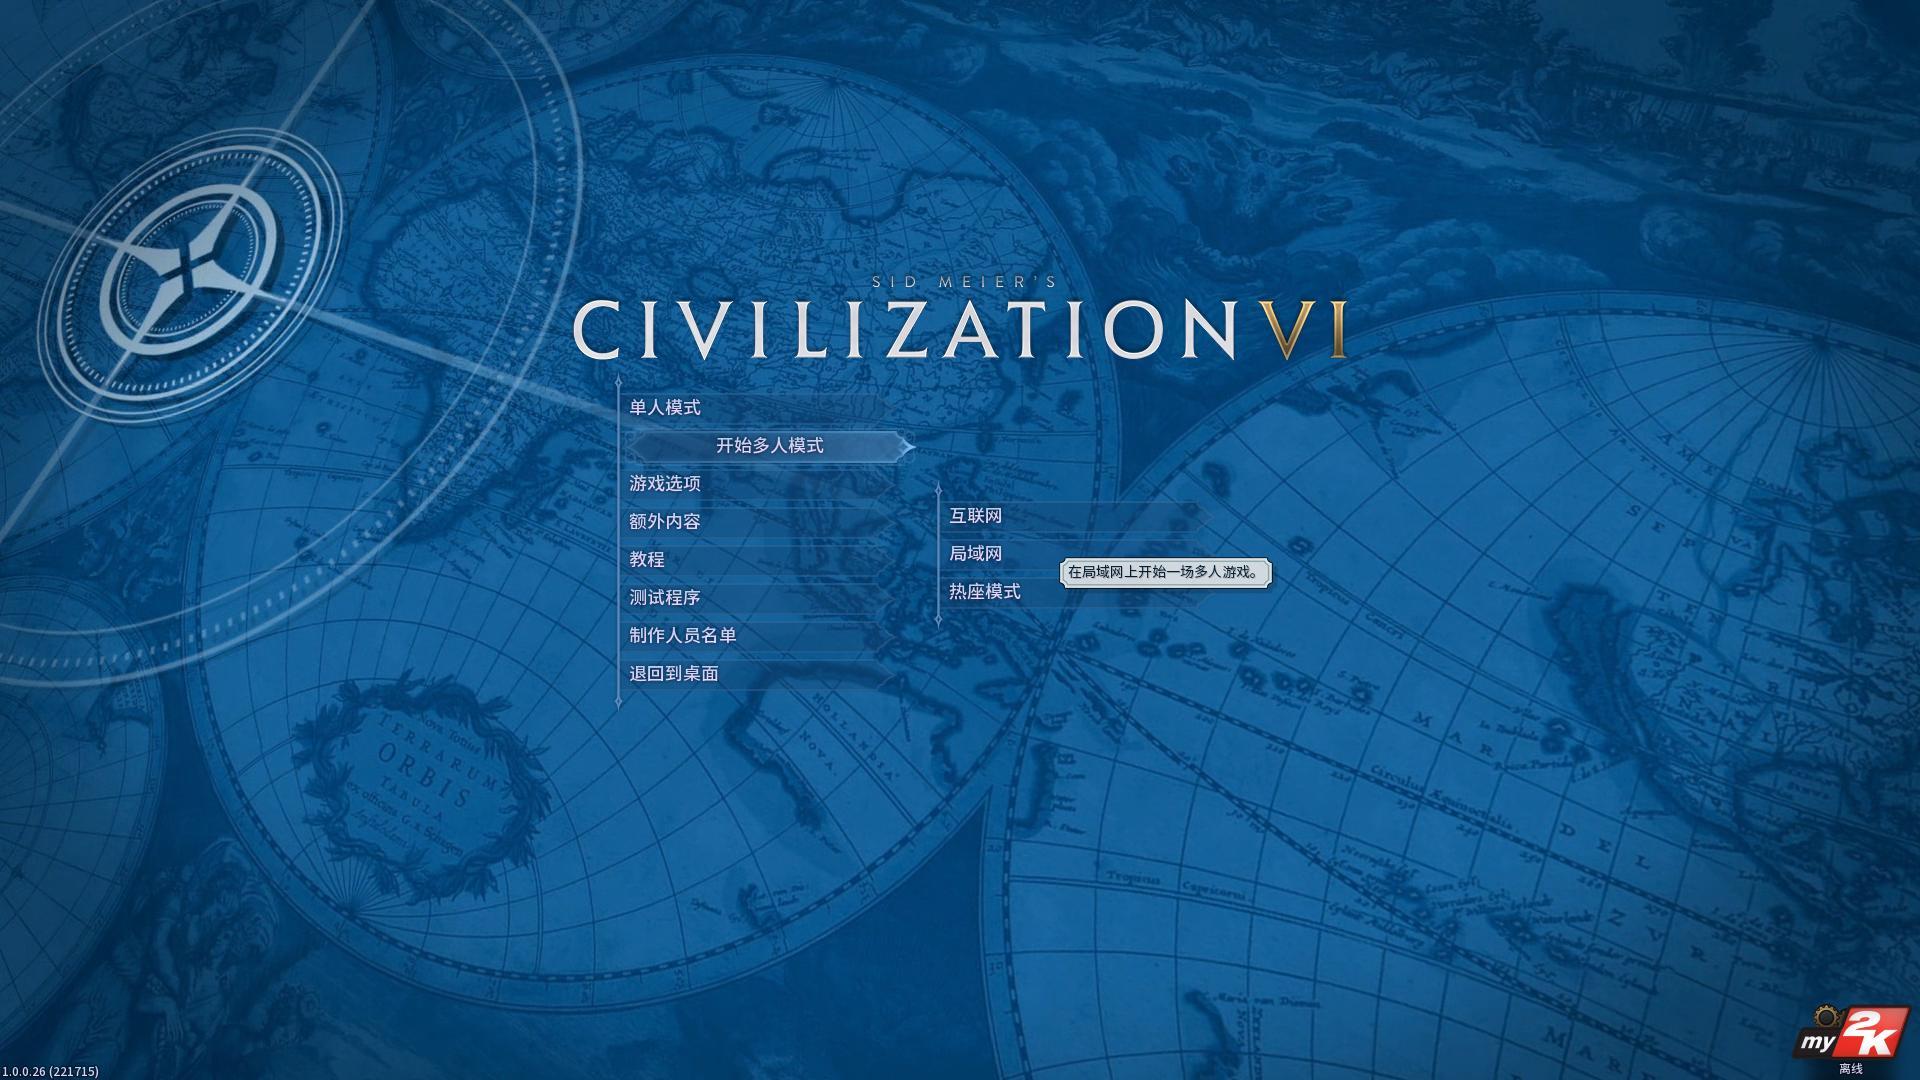 CivilizationVI 2016-10-21 15-06-45-38.jpg